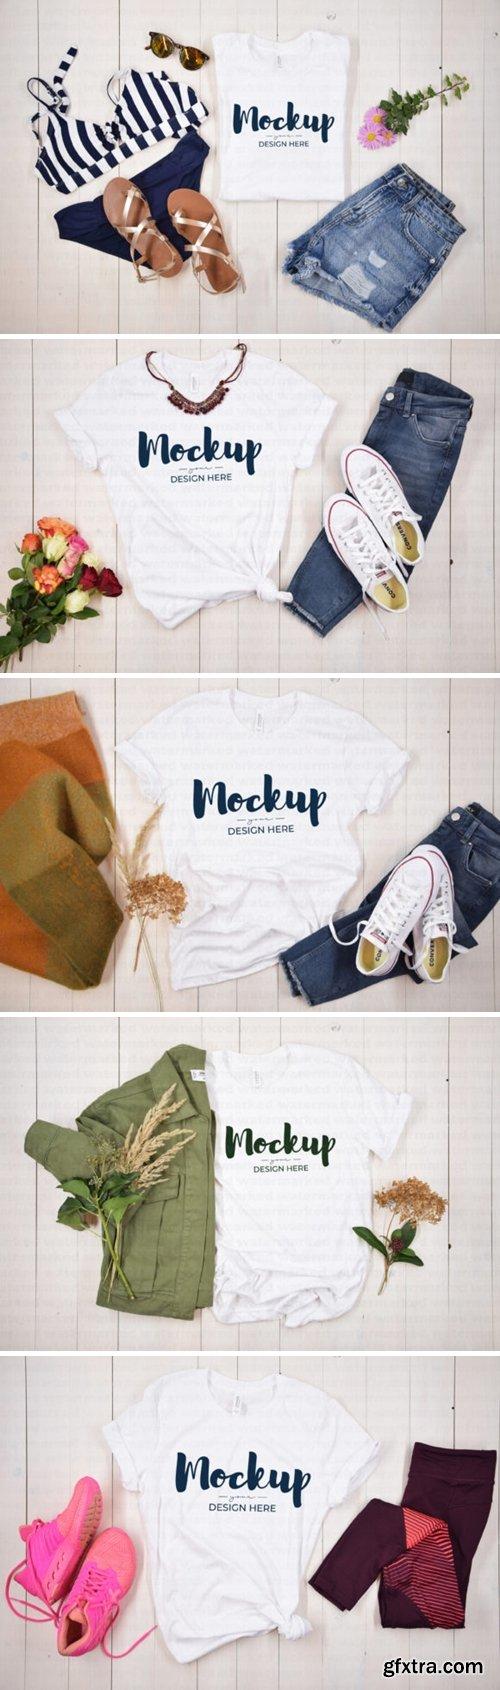 Mega White Shirt Mockup Bundle 7754688